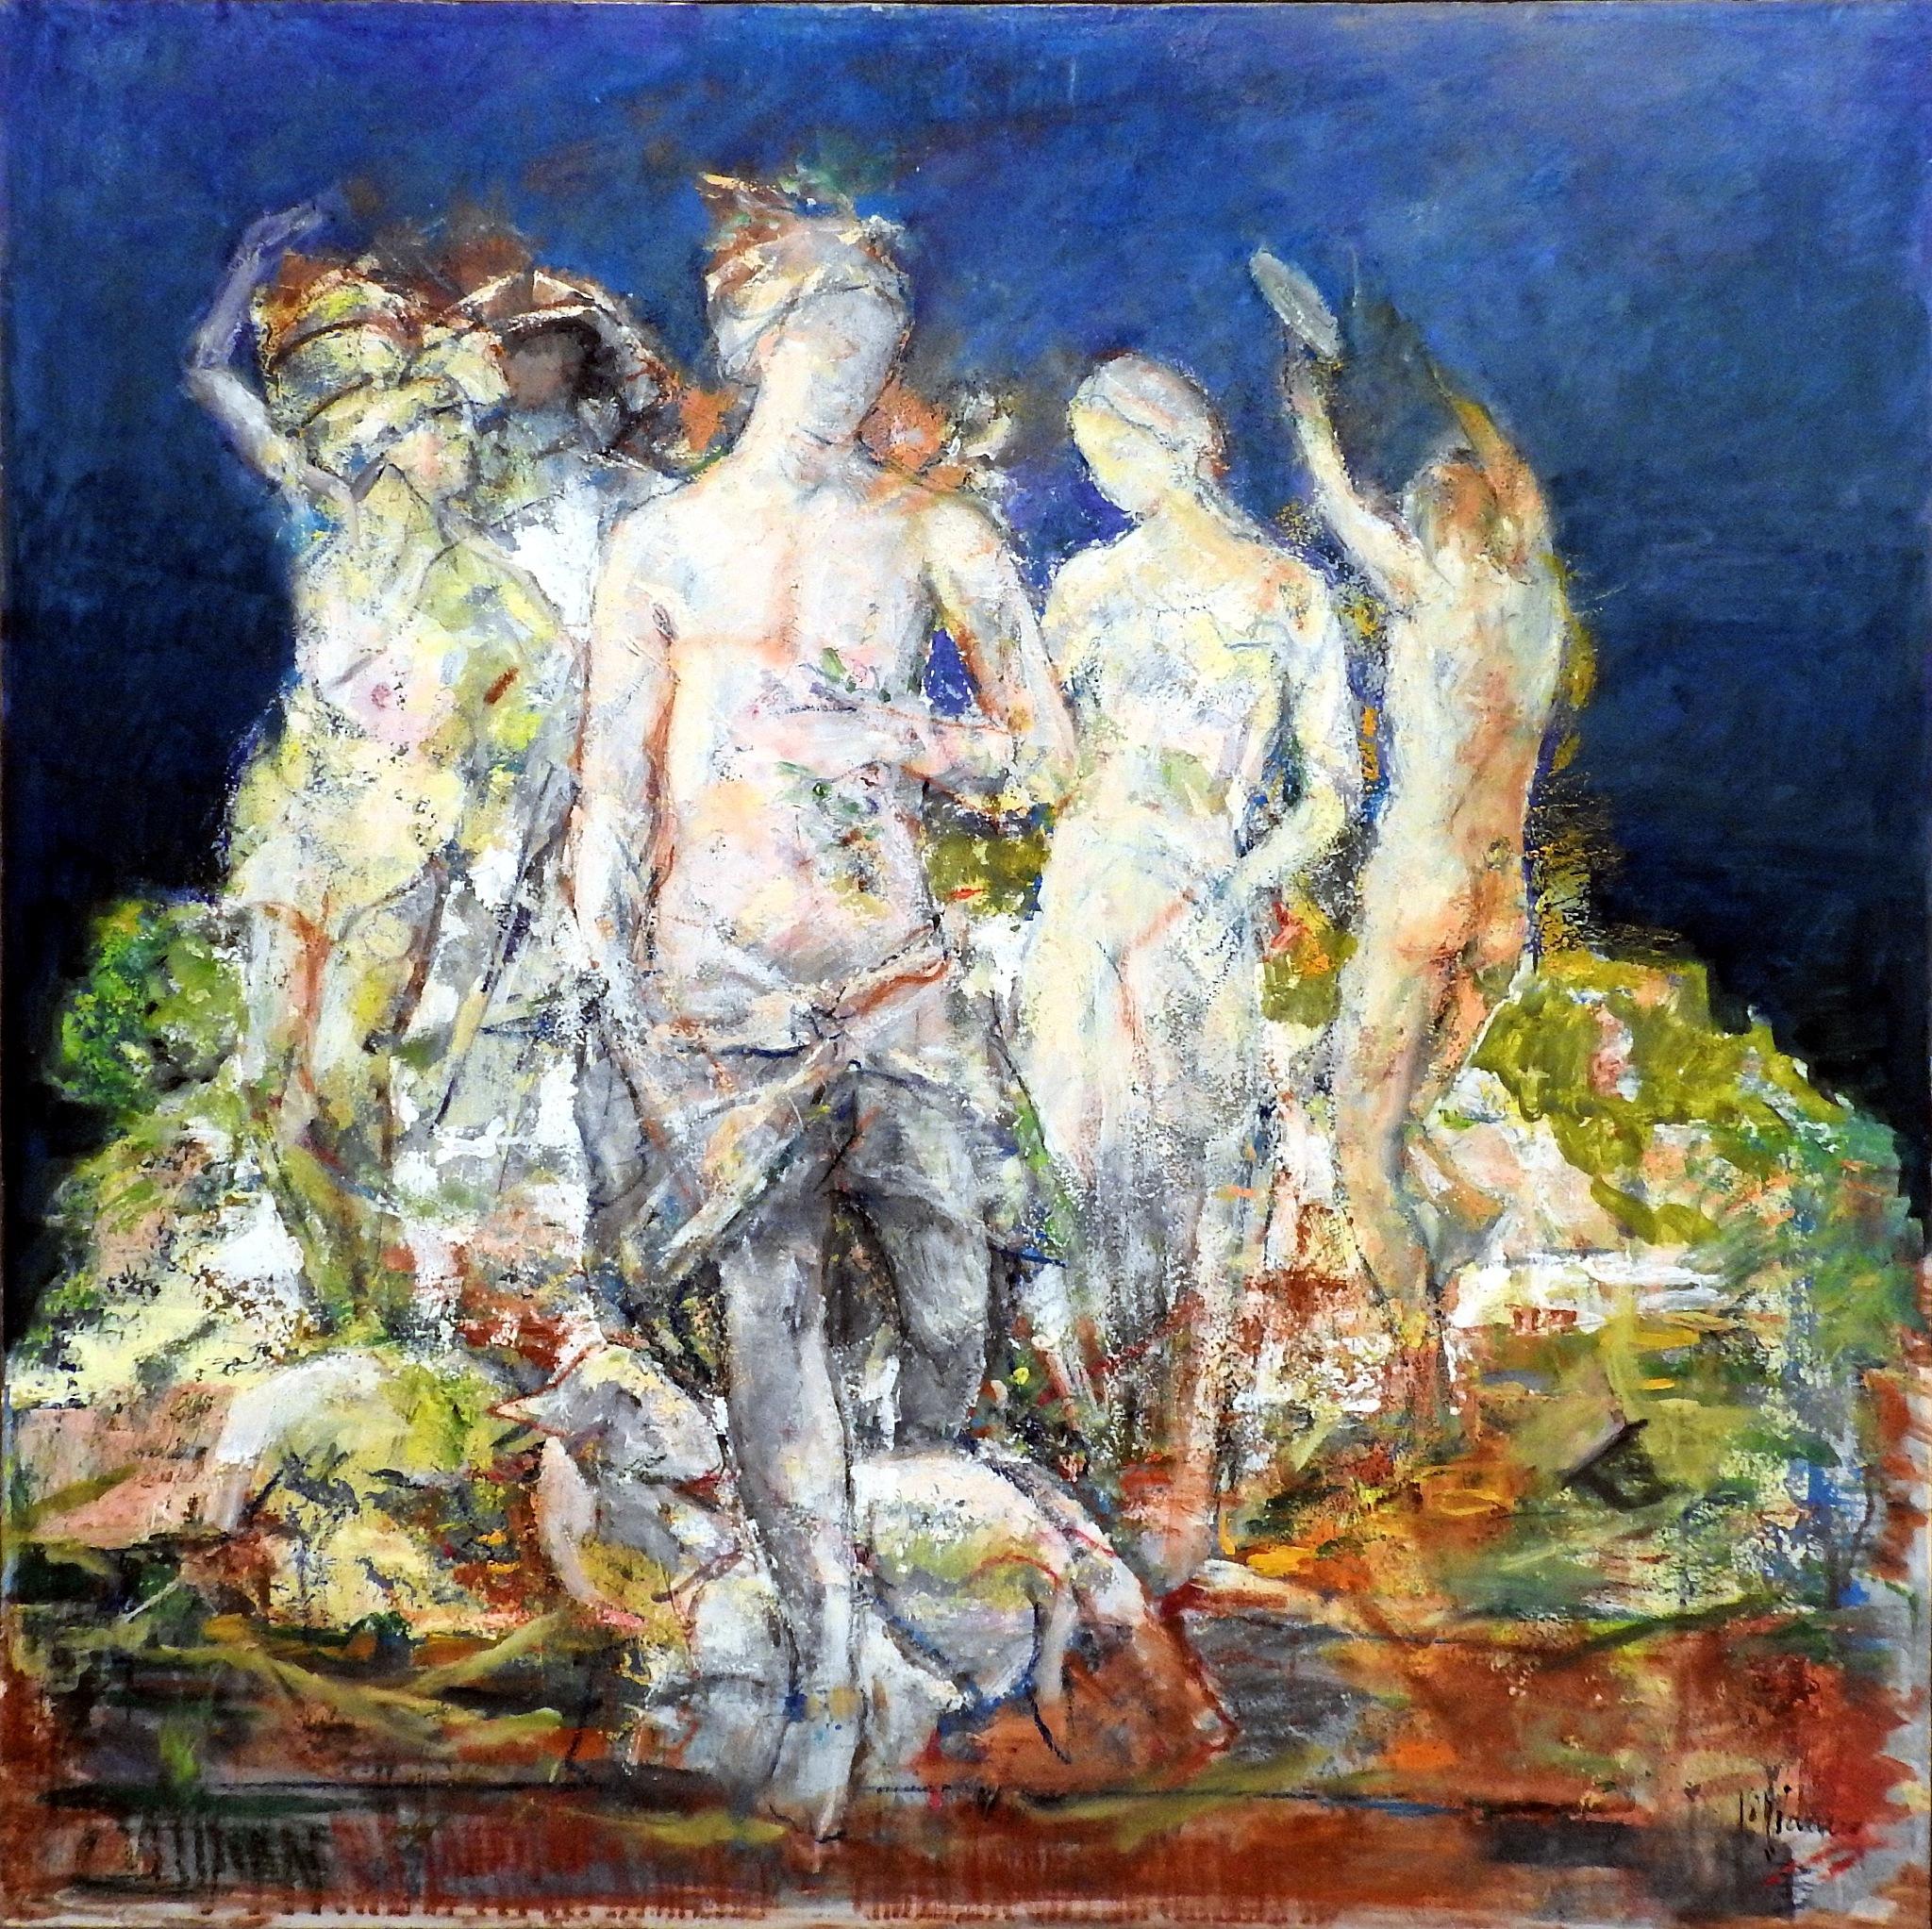 Salvatore Ciaurro - Canti Orfici 2 by Arnaldo De Lisio